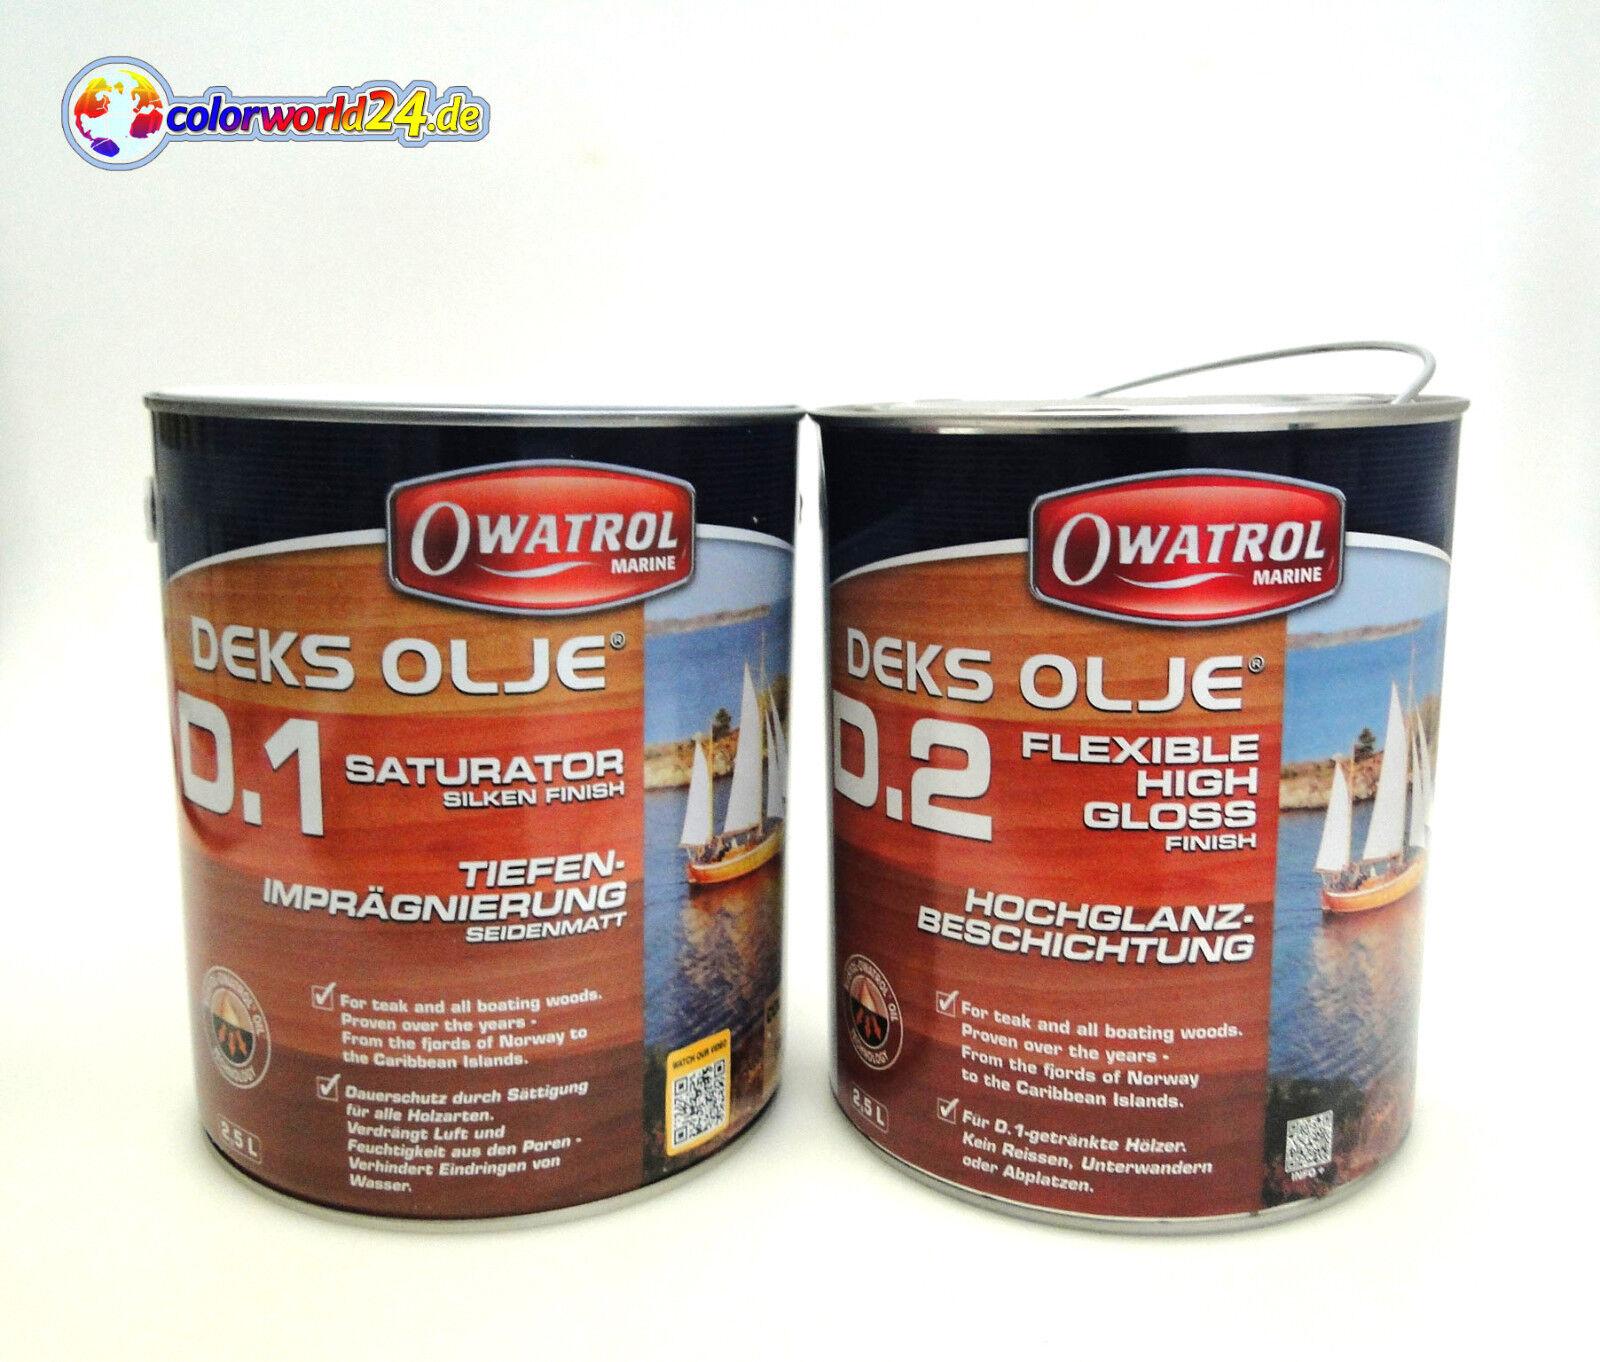 Owatrol Deks Deks Owatrol Olje D1 oder D2 Holzöl, Marine, Stiefel, Schiff, 338f52